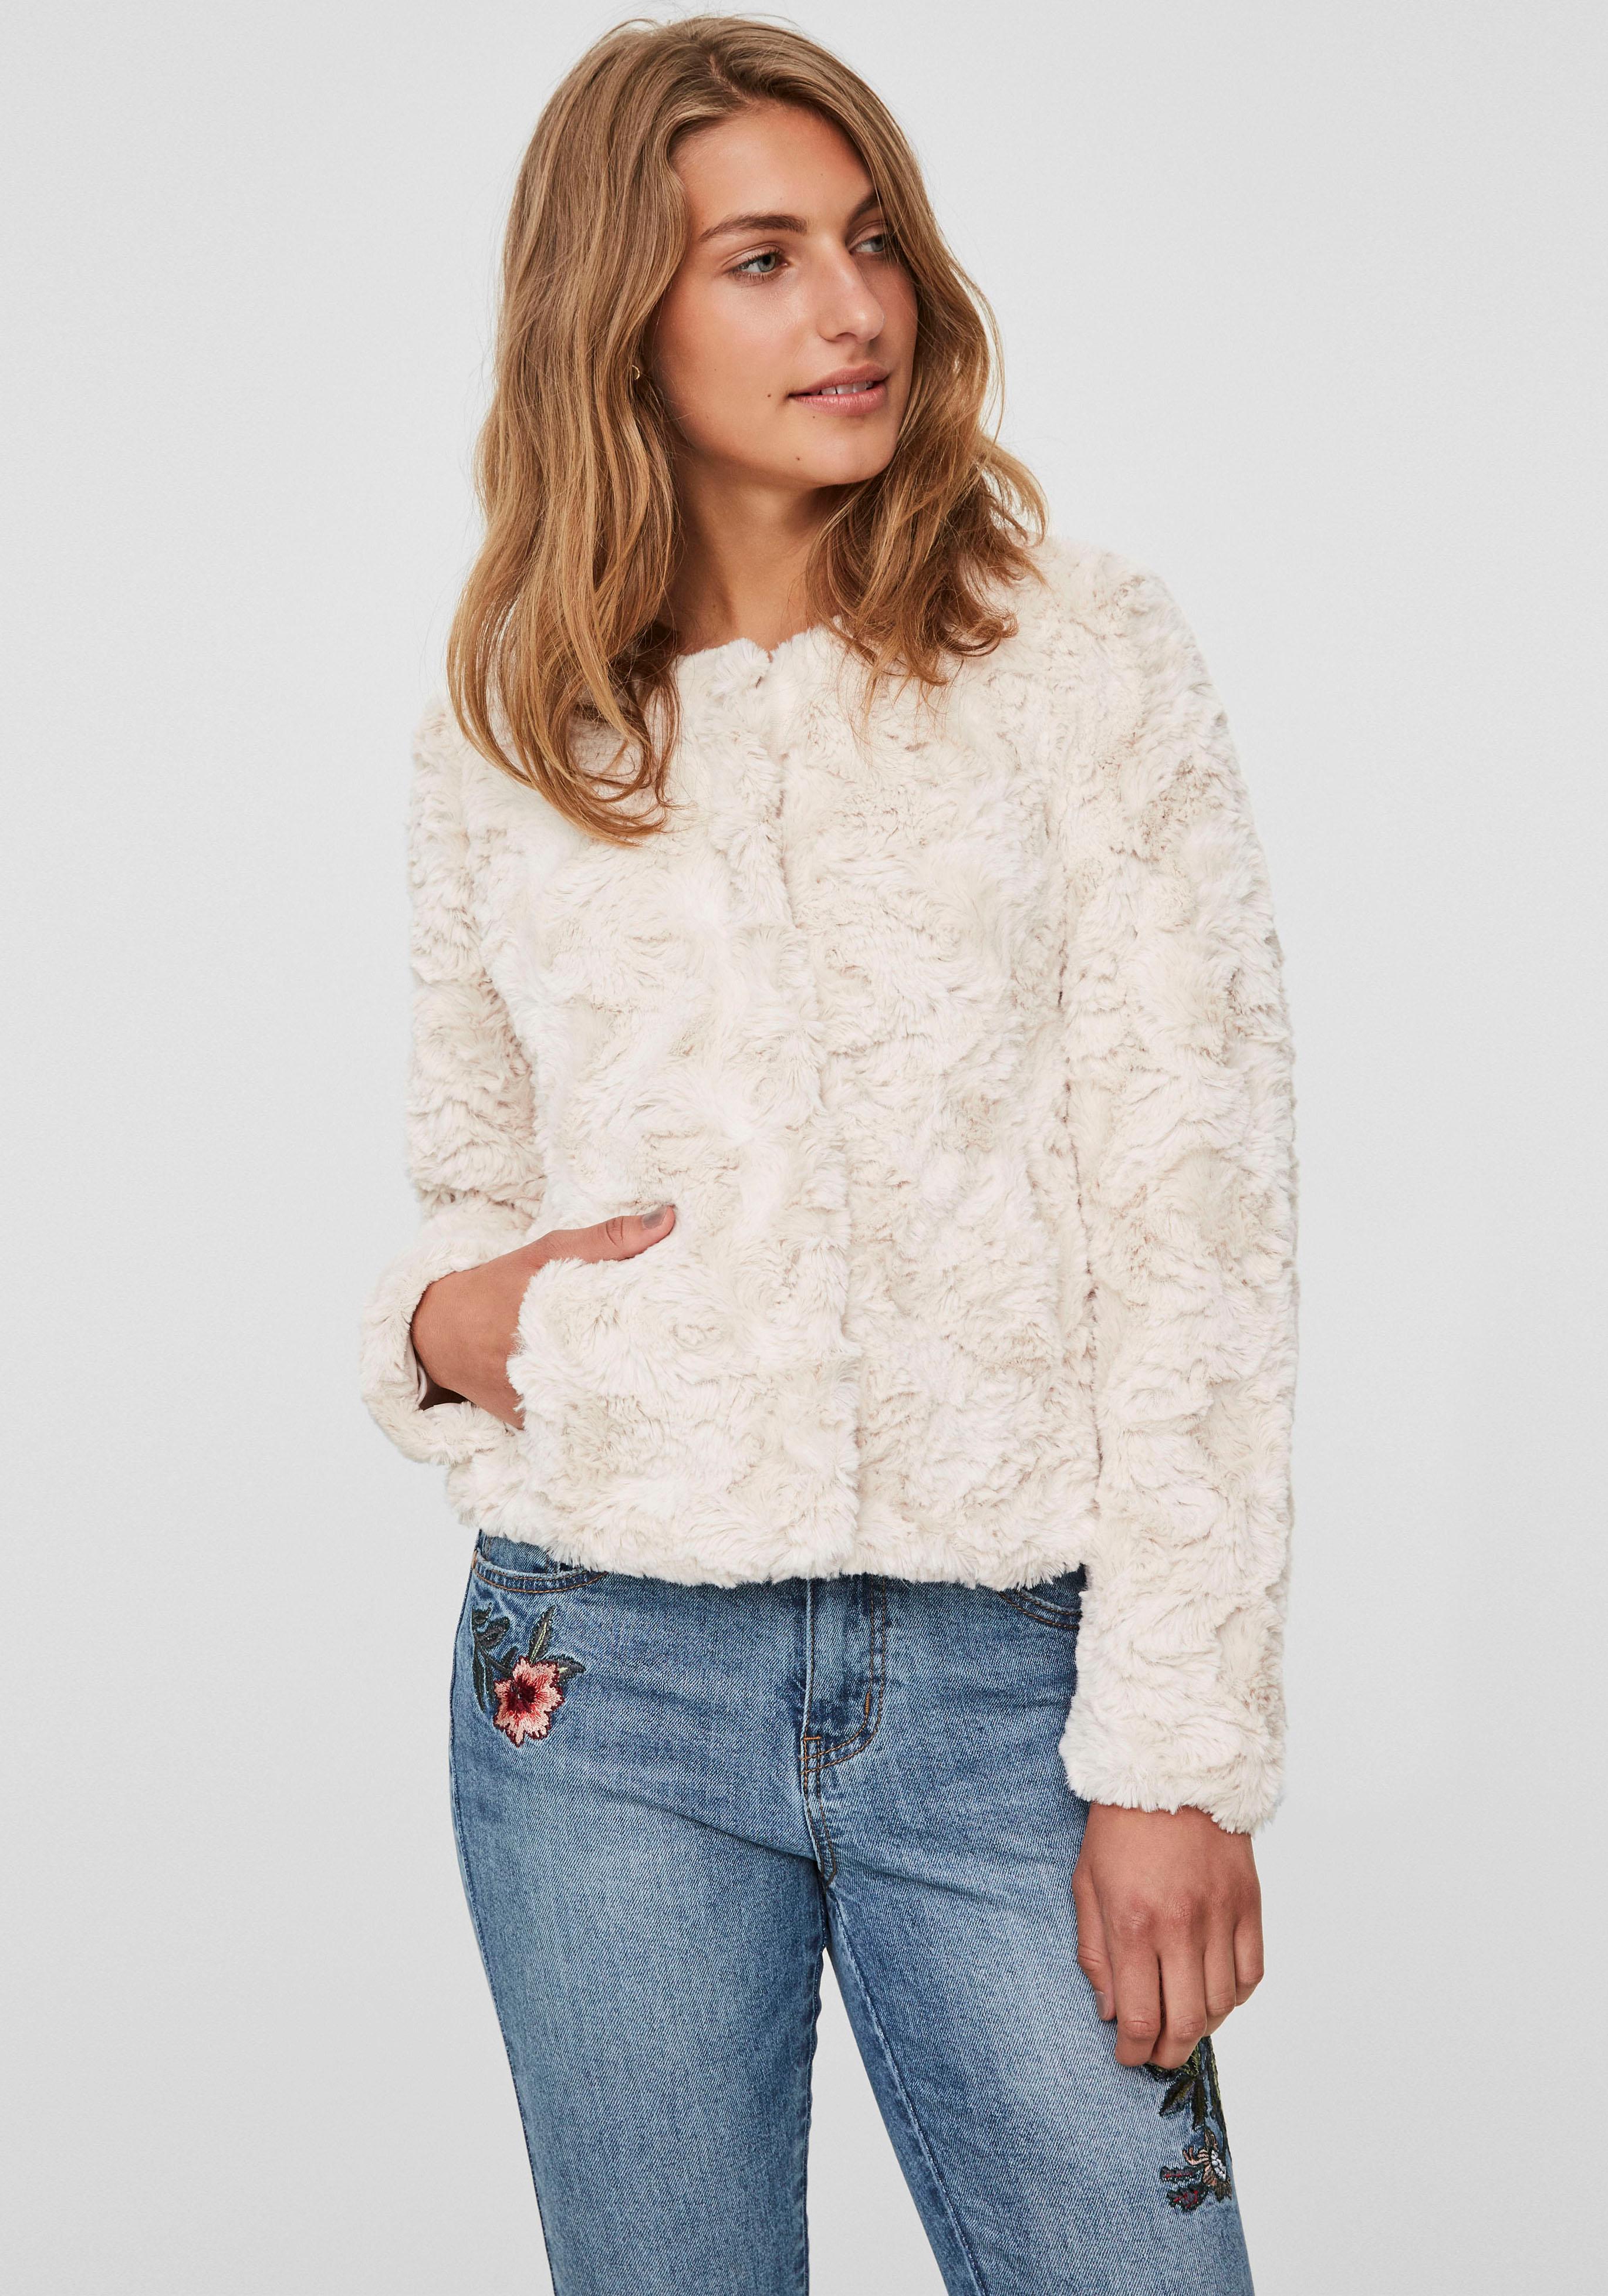 Vero Moda Fellimitatjacke CURL | Bekleidung > Jacken > Fellimitatjacken | Weiß | Vero Moda